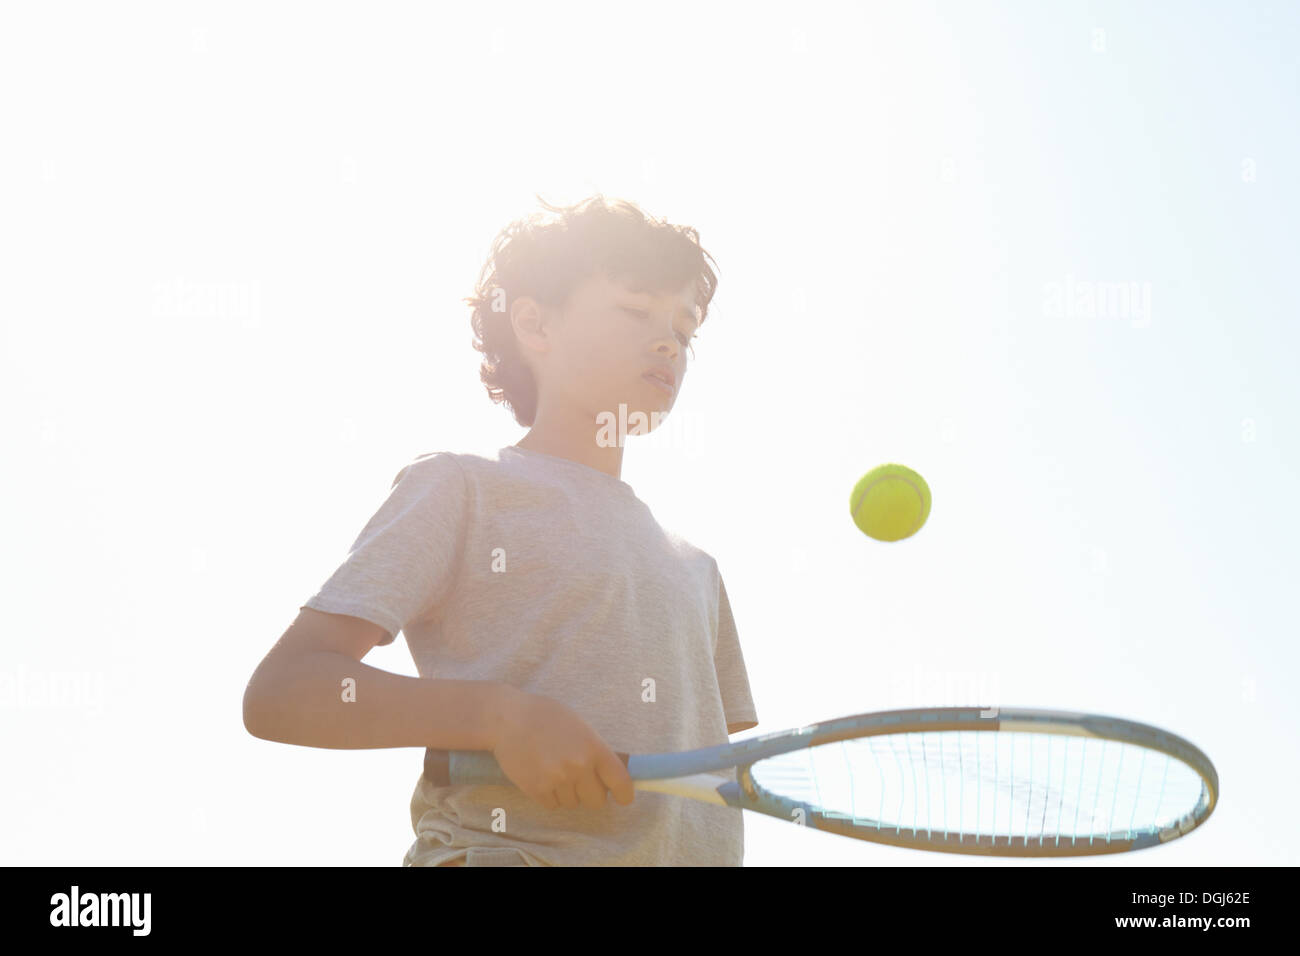 Boy bouncing ball on tennis racket - Stock Image